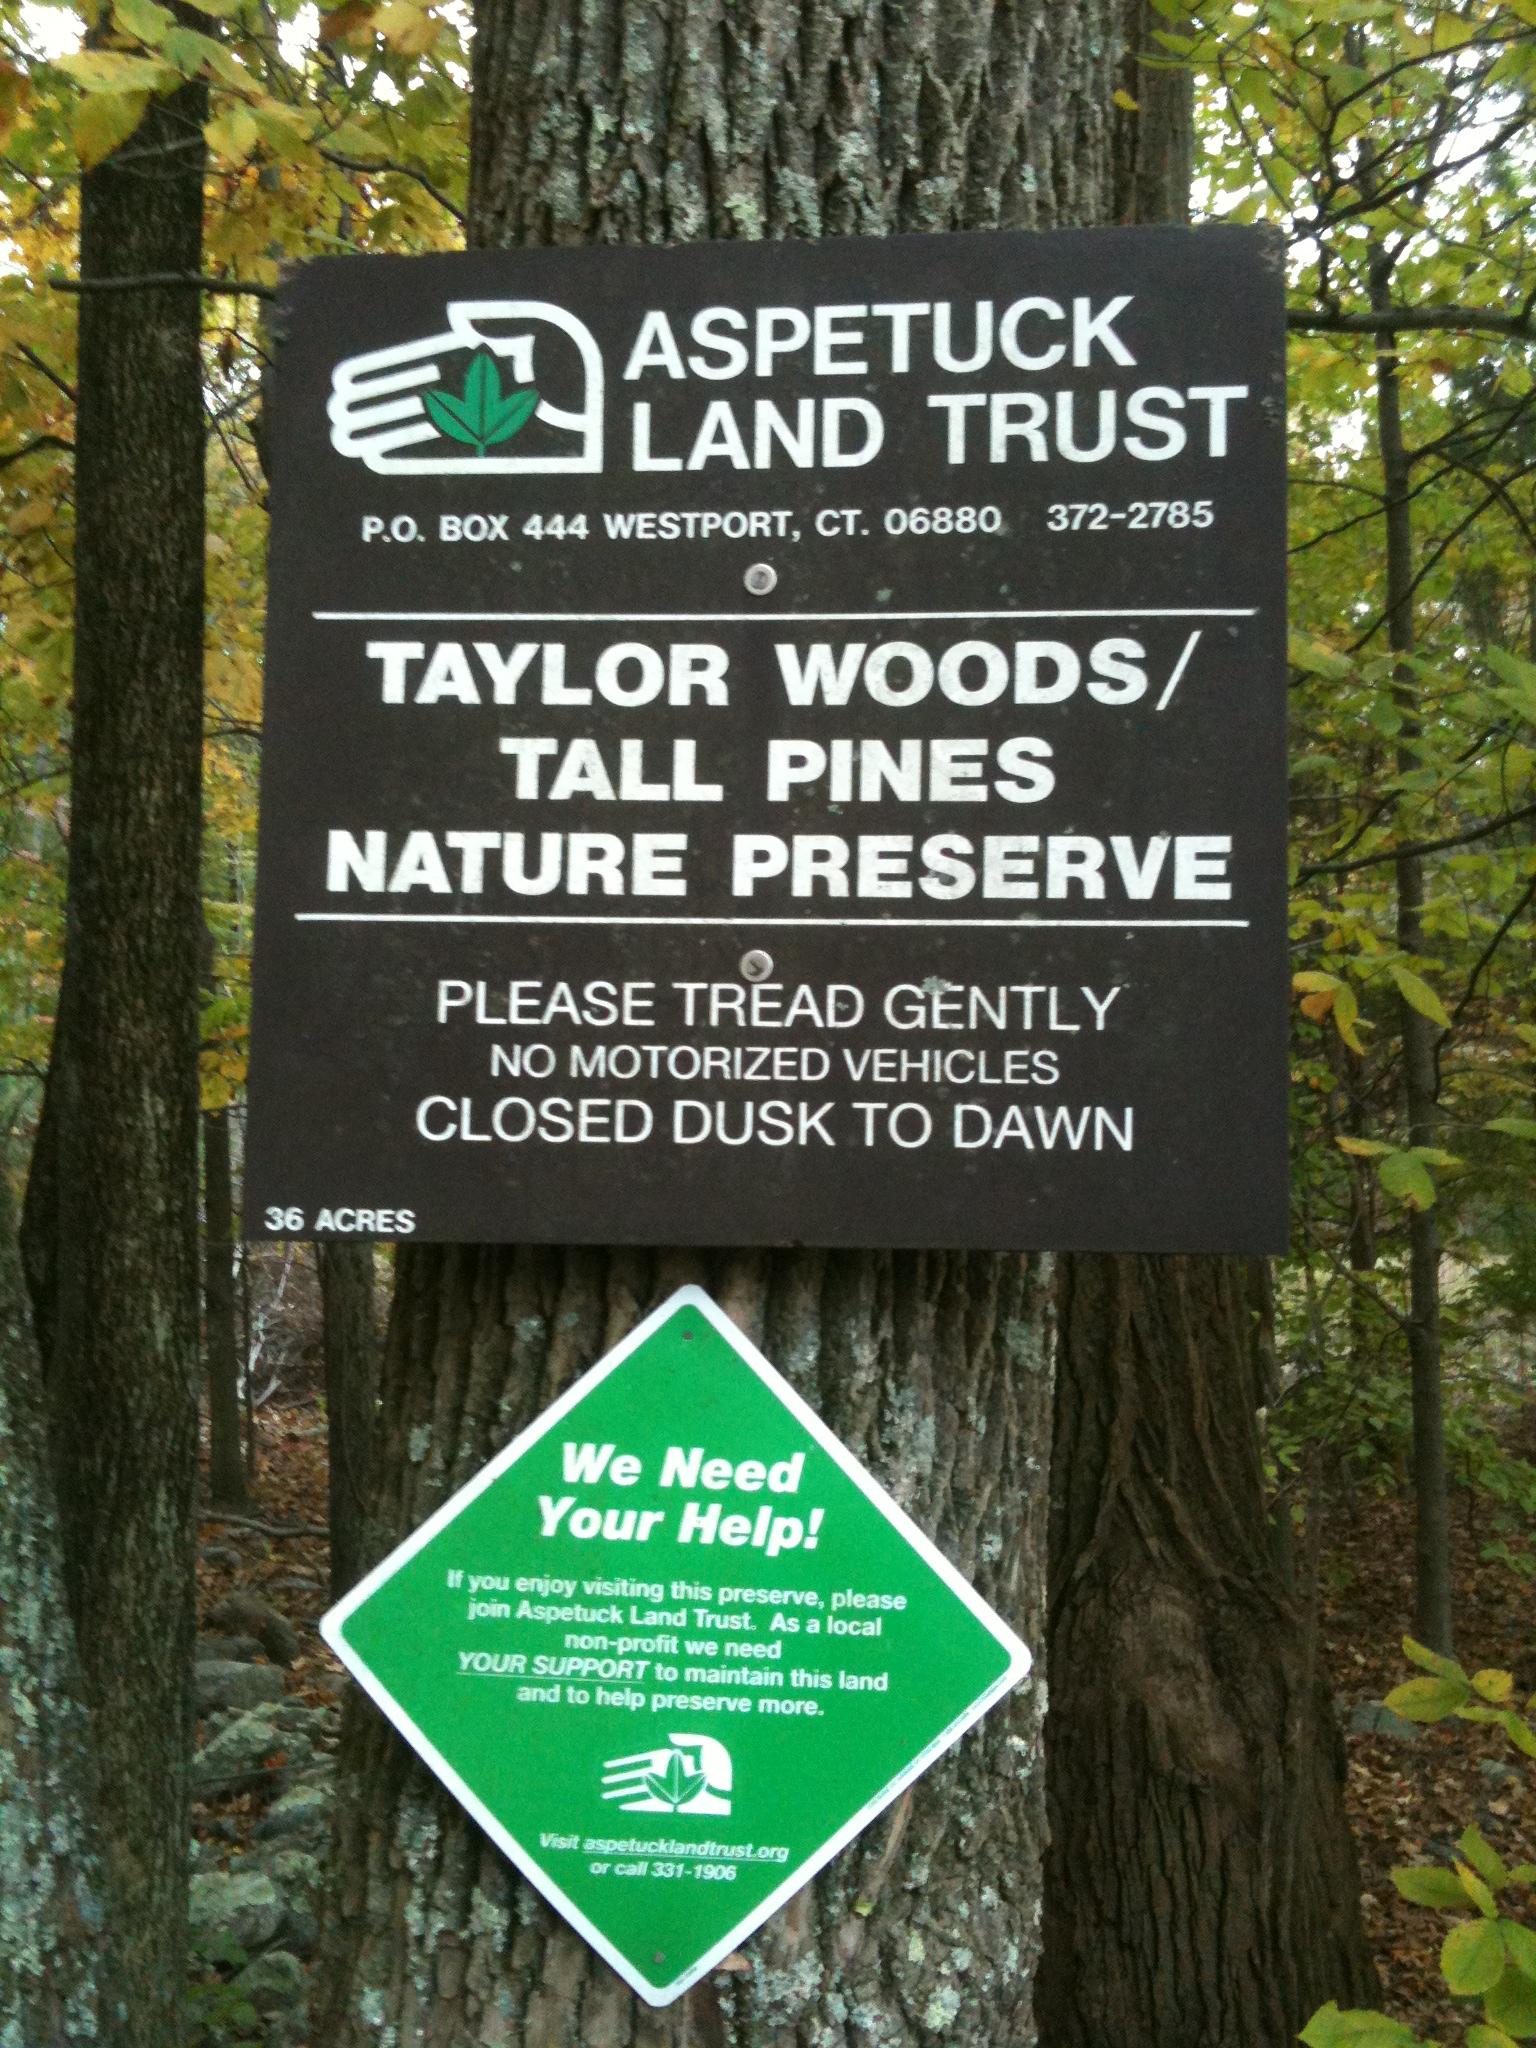 Weston Taylor Woods Tall Pines 2.jpg